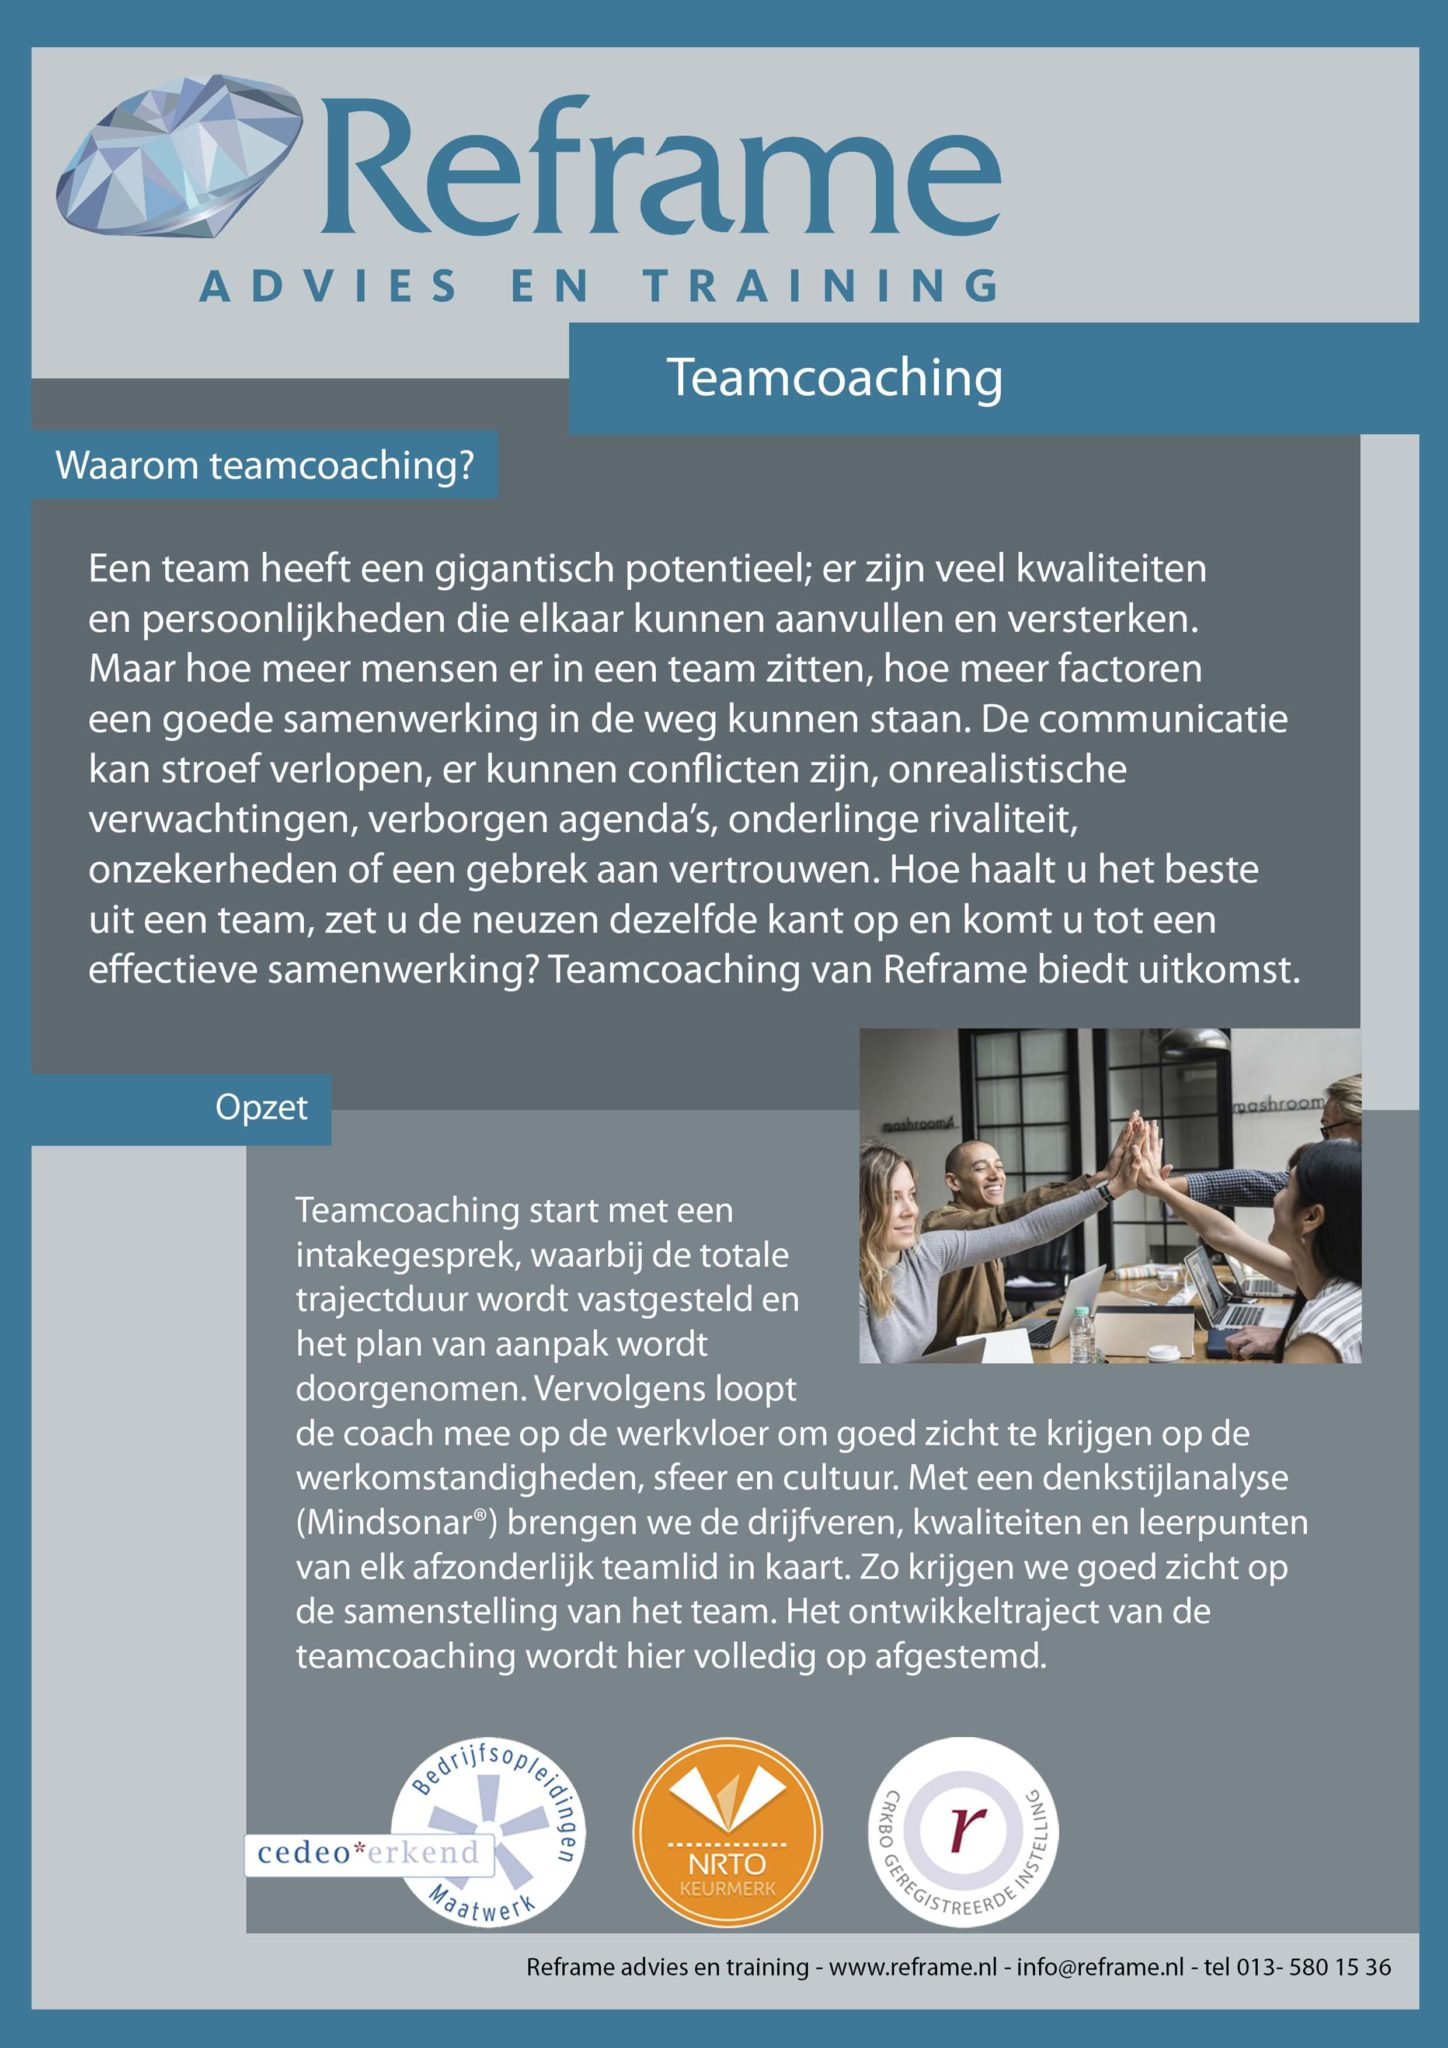 Teamcoaching klein 1